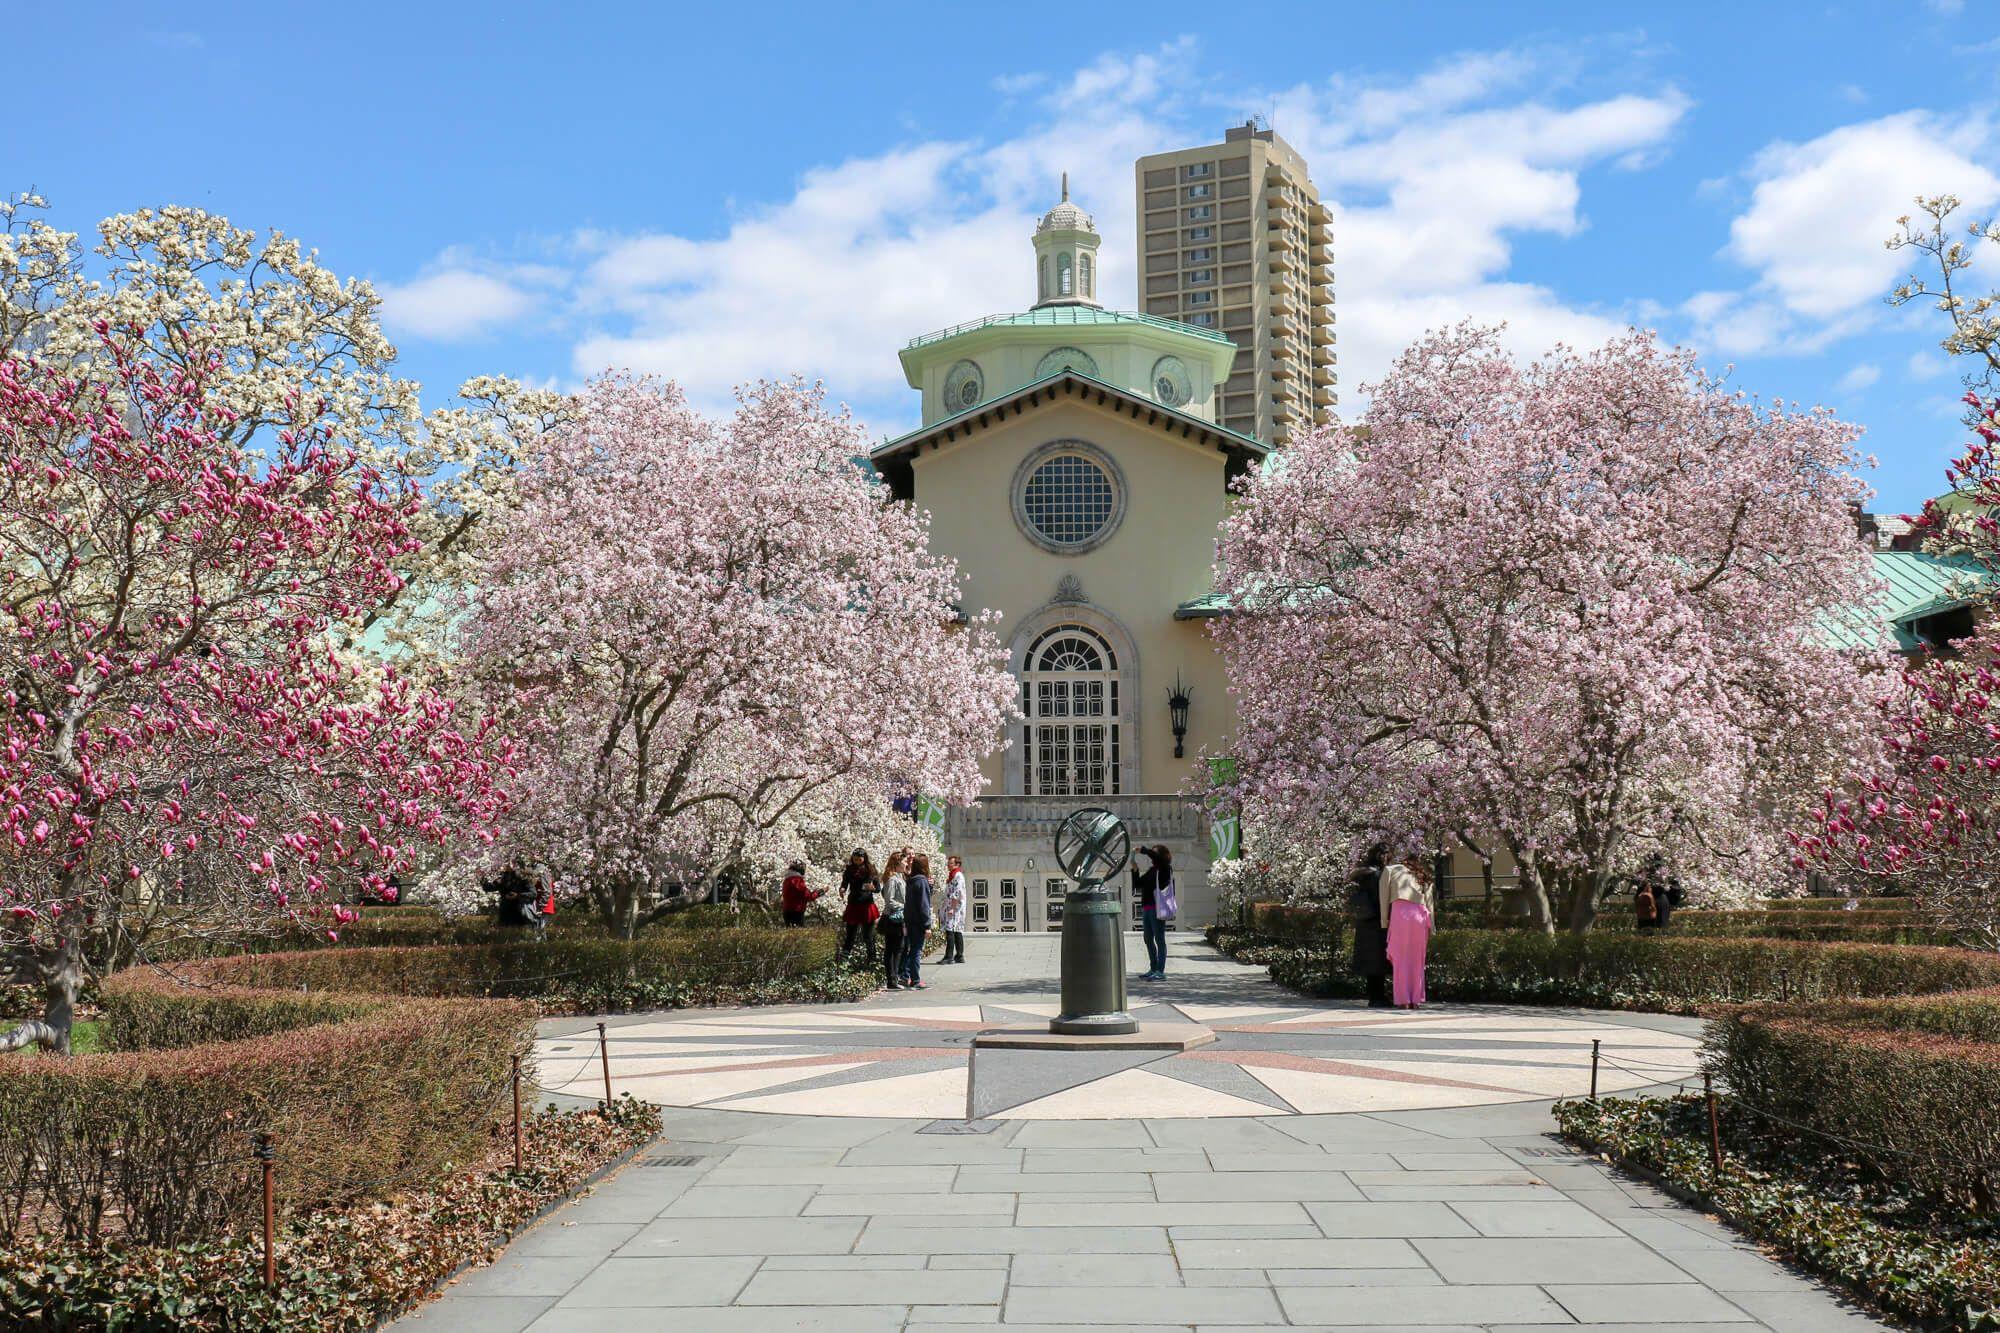 New York City Brooklyn Magnolia Plaza Brooklyn Botanic Gardens 2018 Botanical Gardens Botanical Flowering Cherry Tree